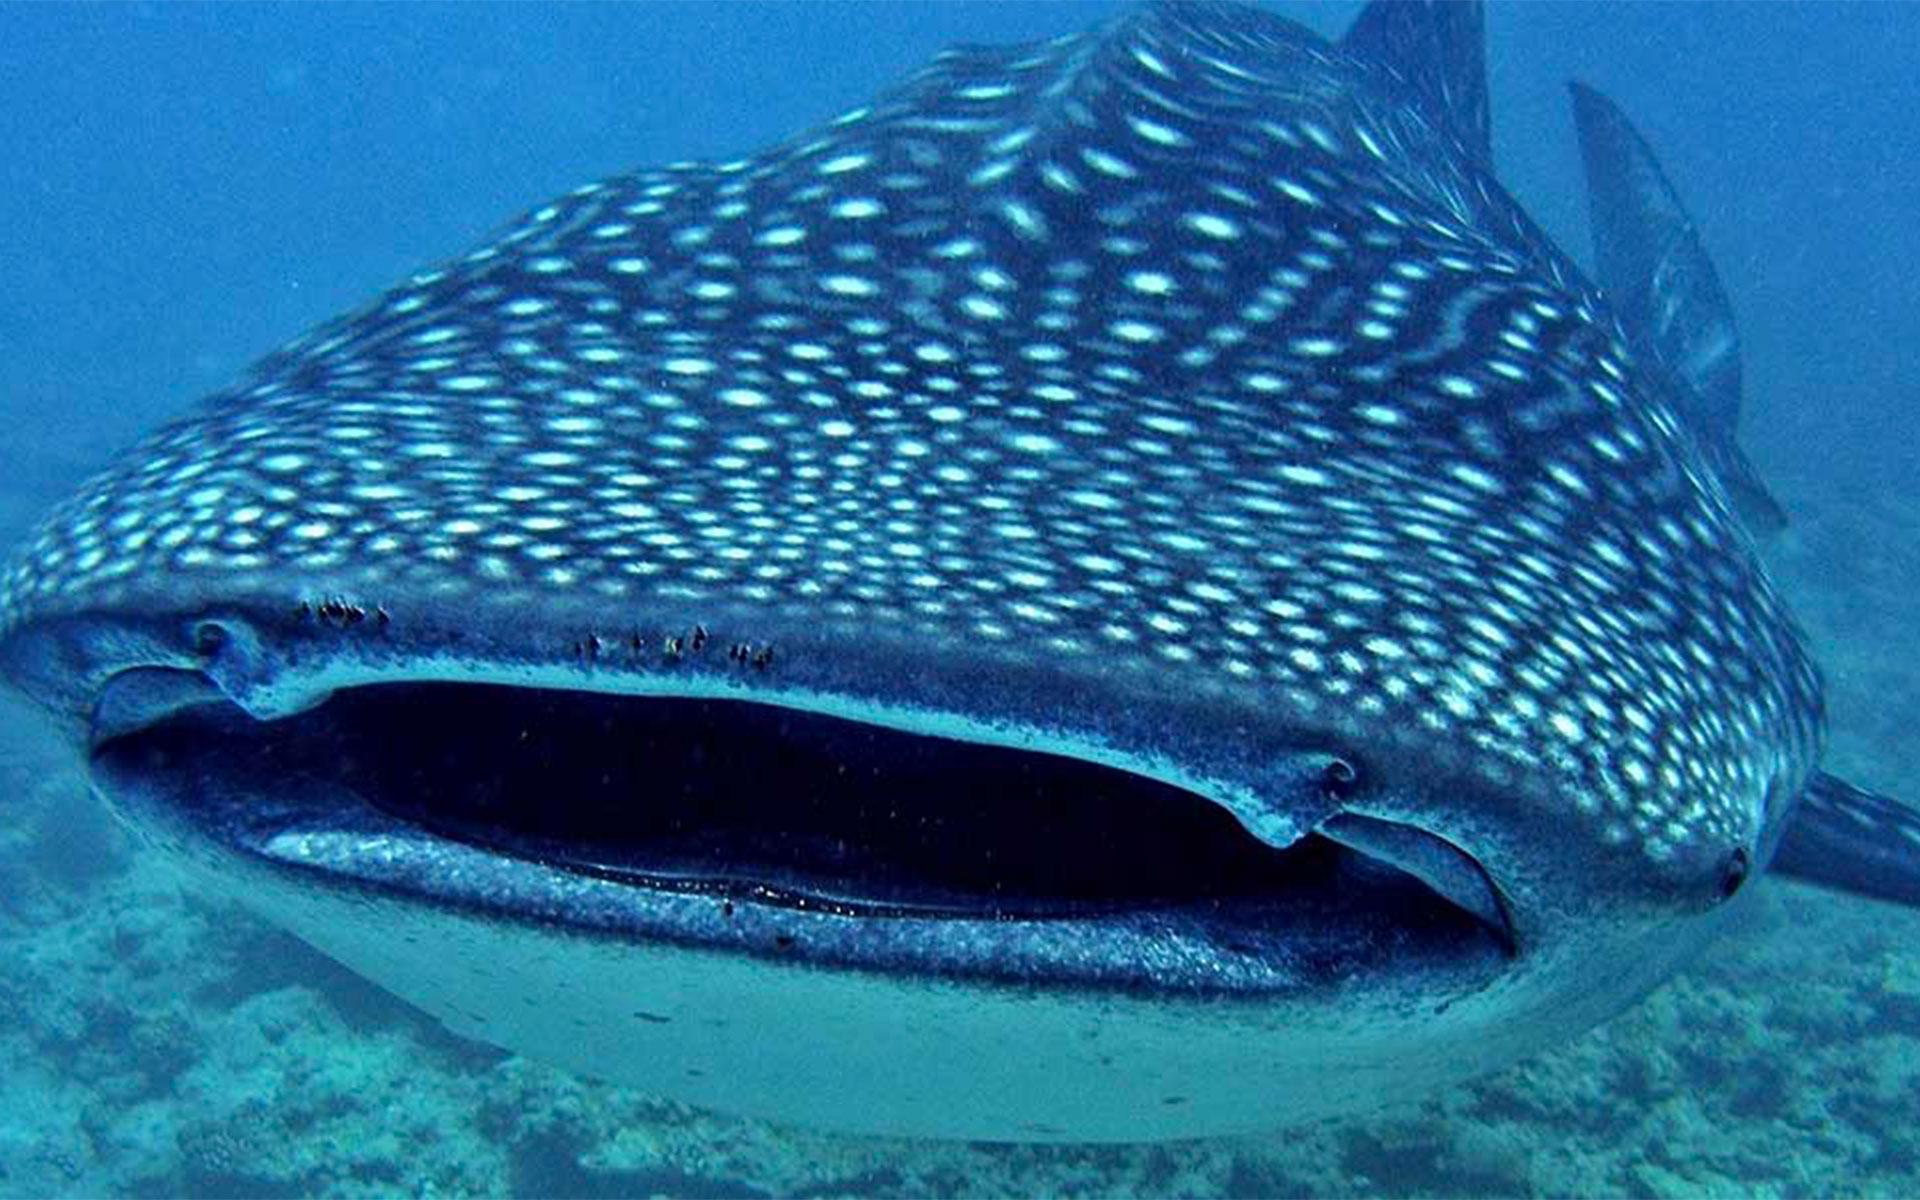 Maldives Marine Lab - The BIG FISH Network South Ari Atoll ...